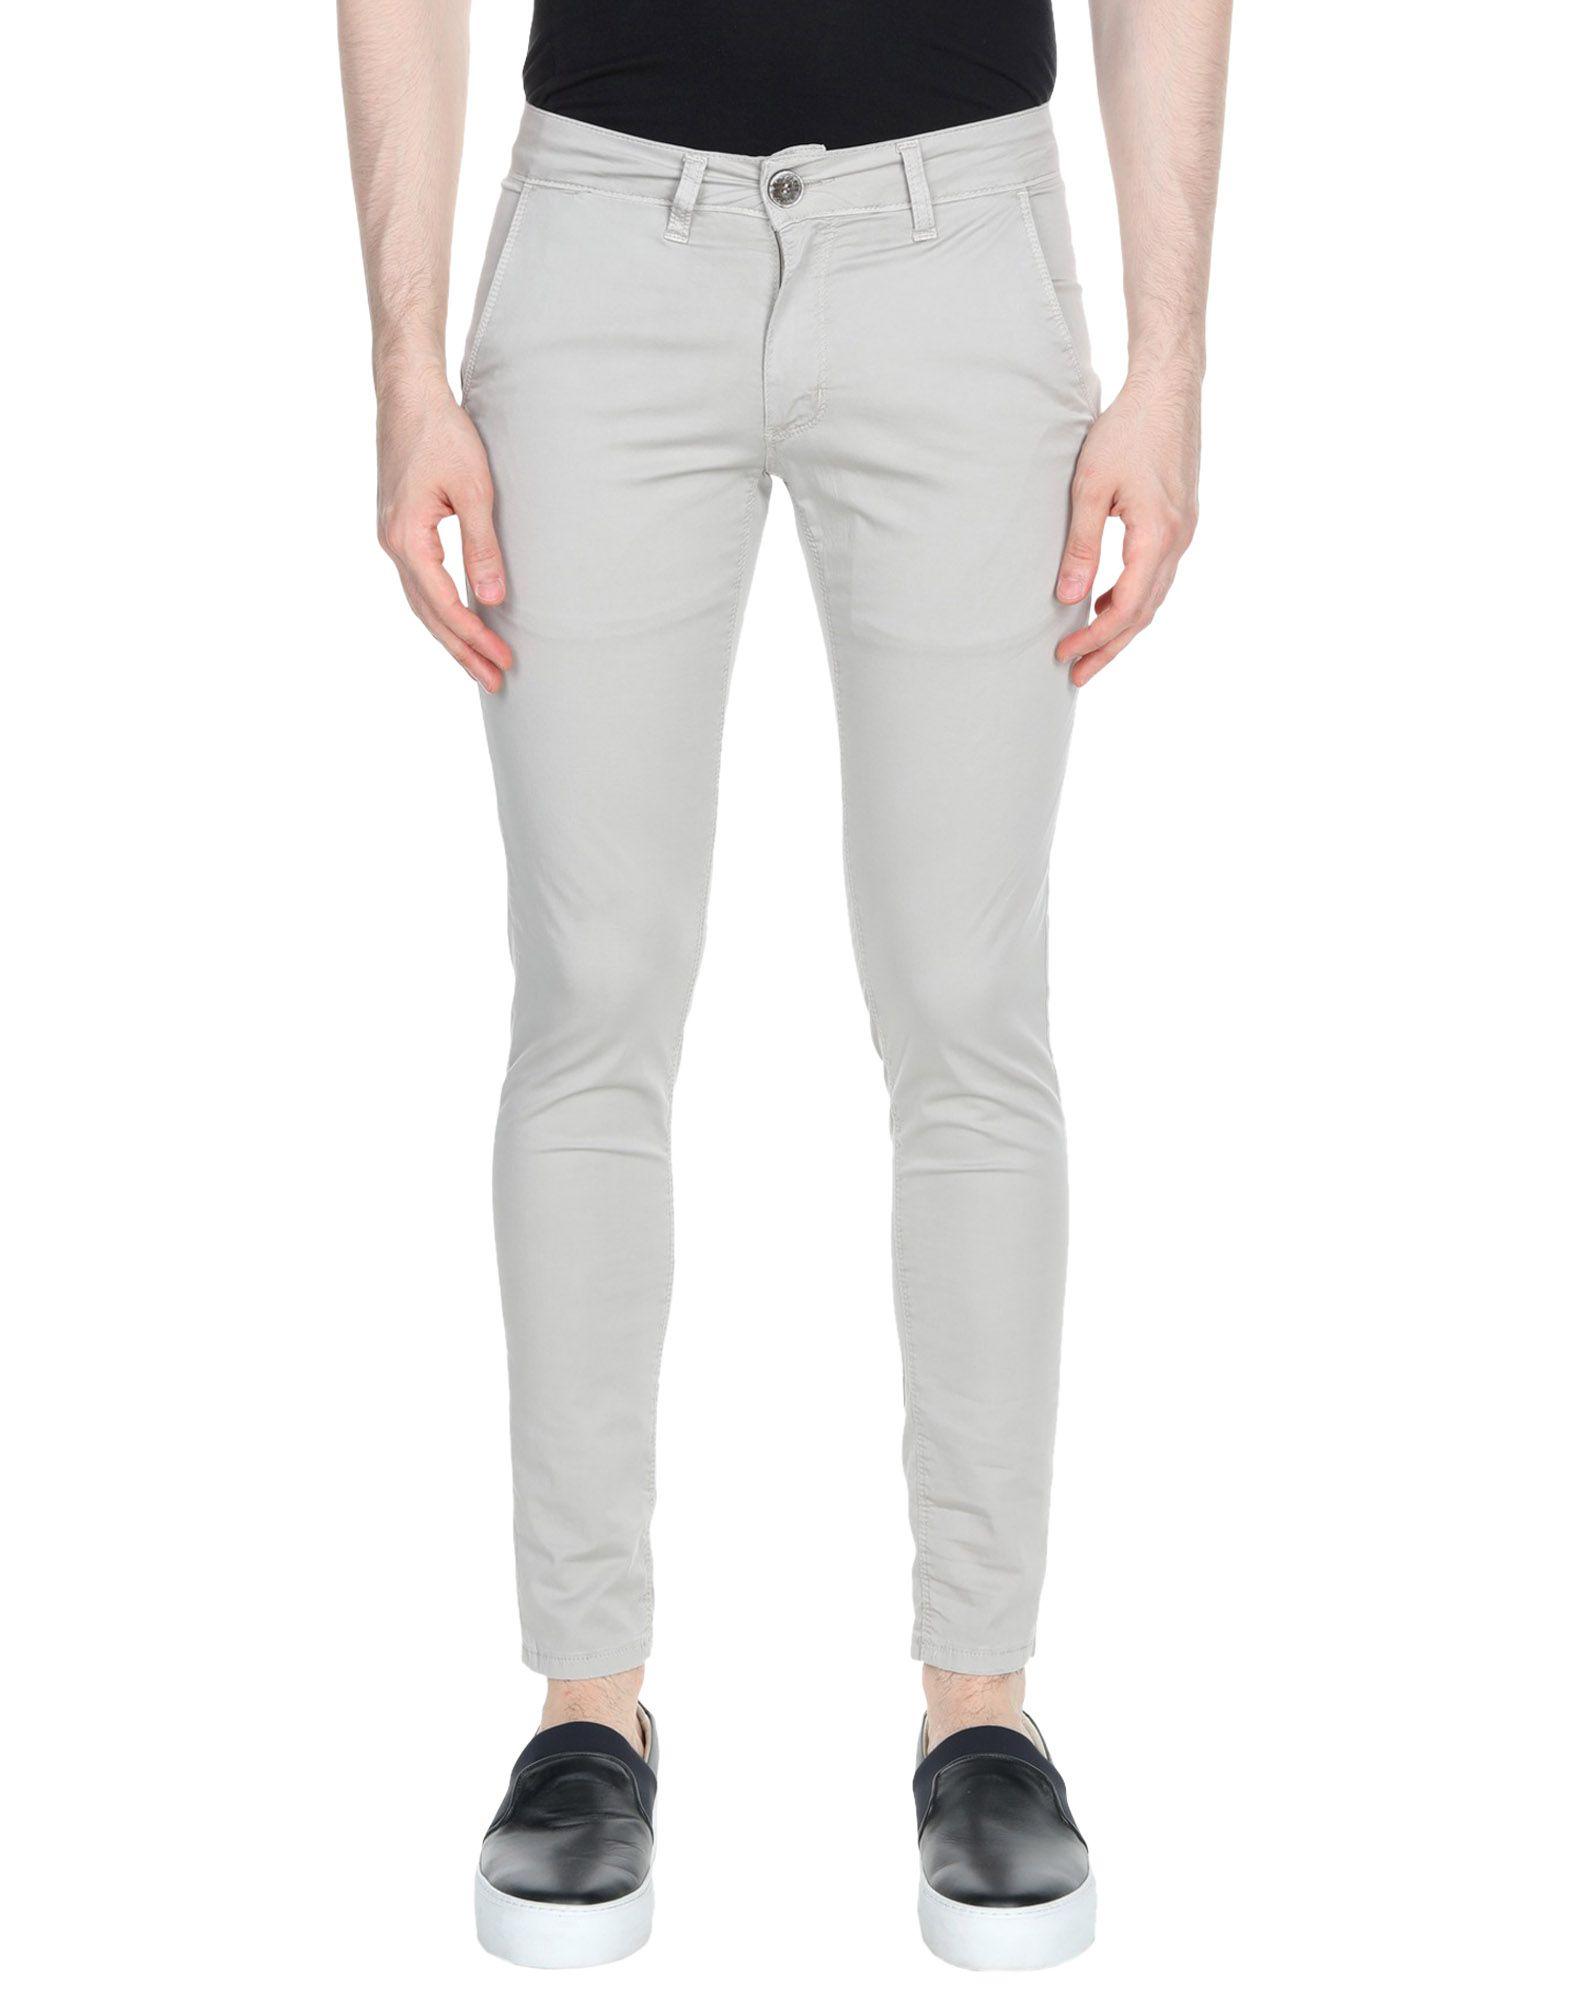 ENJOY BRAND+JEANS Повседневные брюки new summer casual cotton men short jeans fashion brand men s bermuda boardshorts jeans shorts mens ripped plus size 28 36